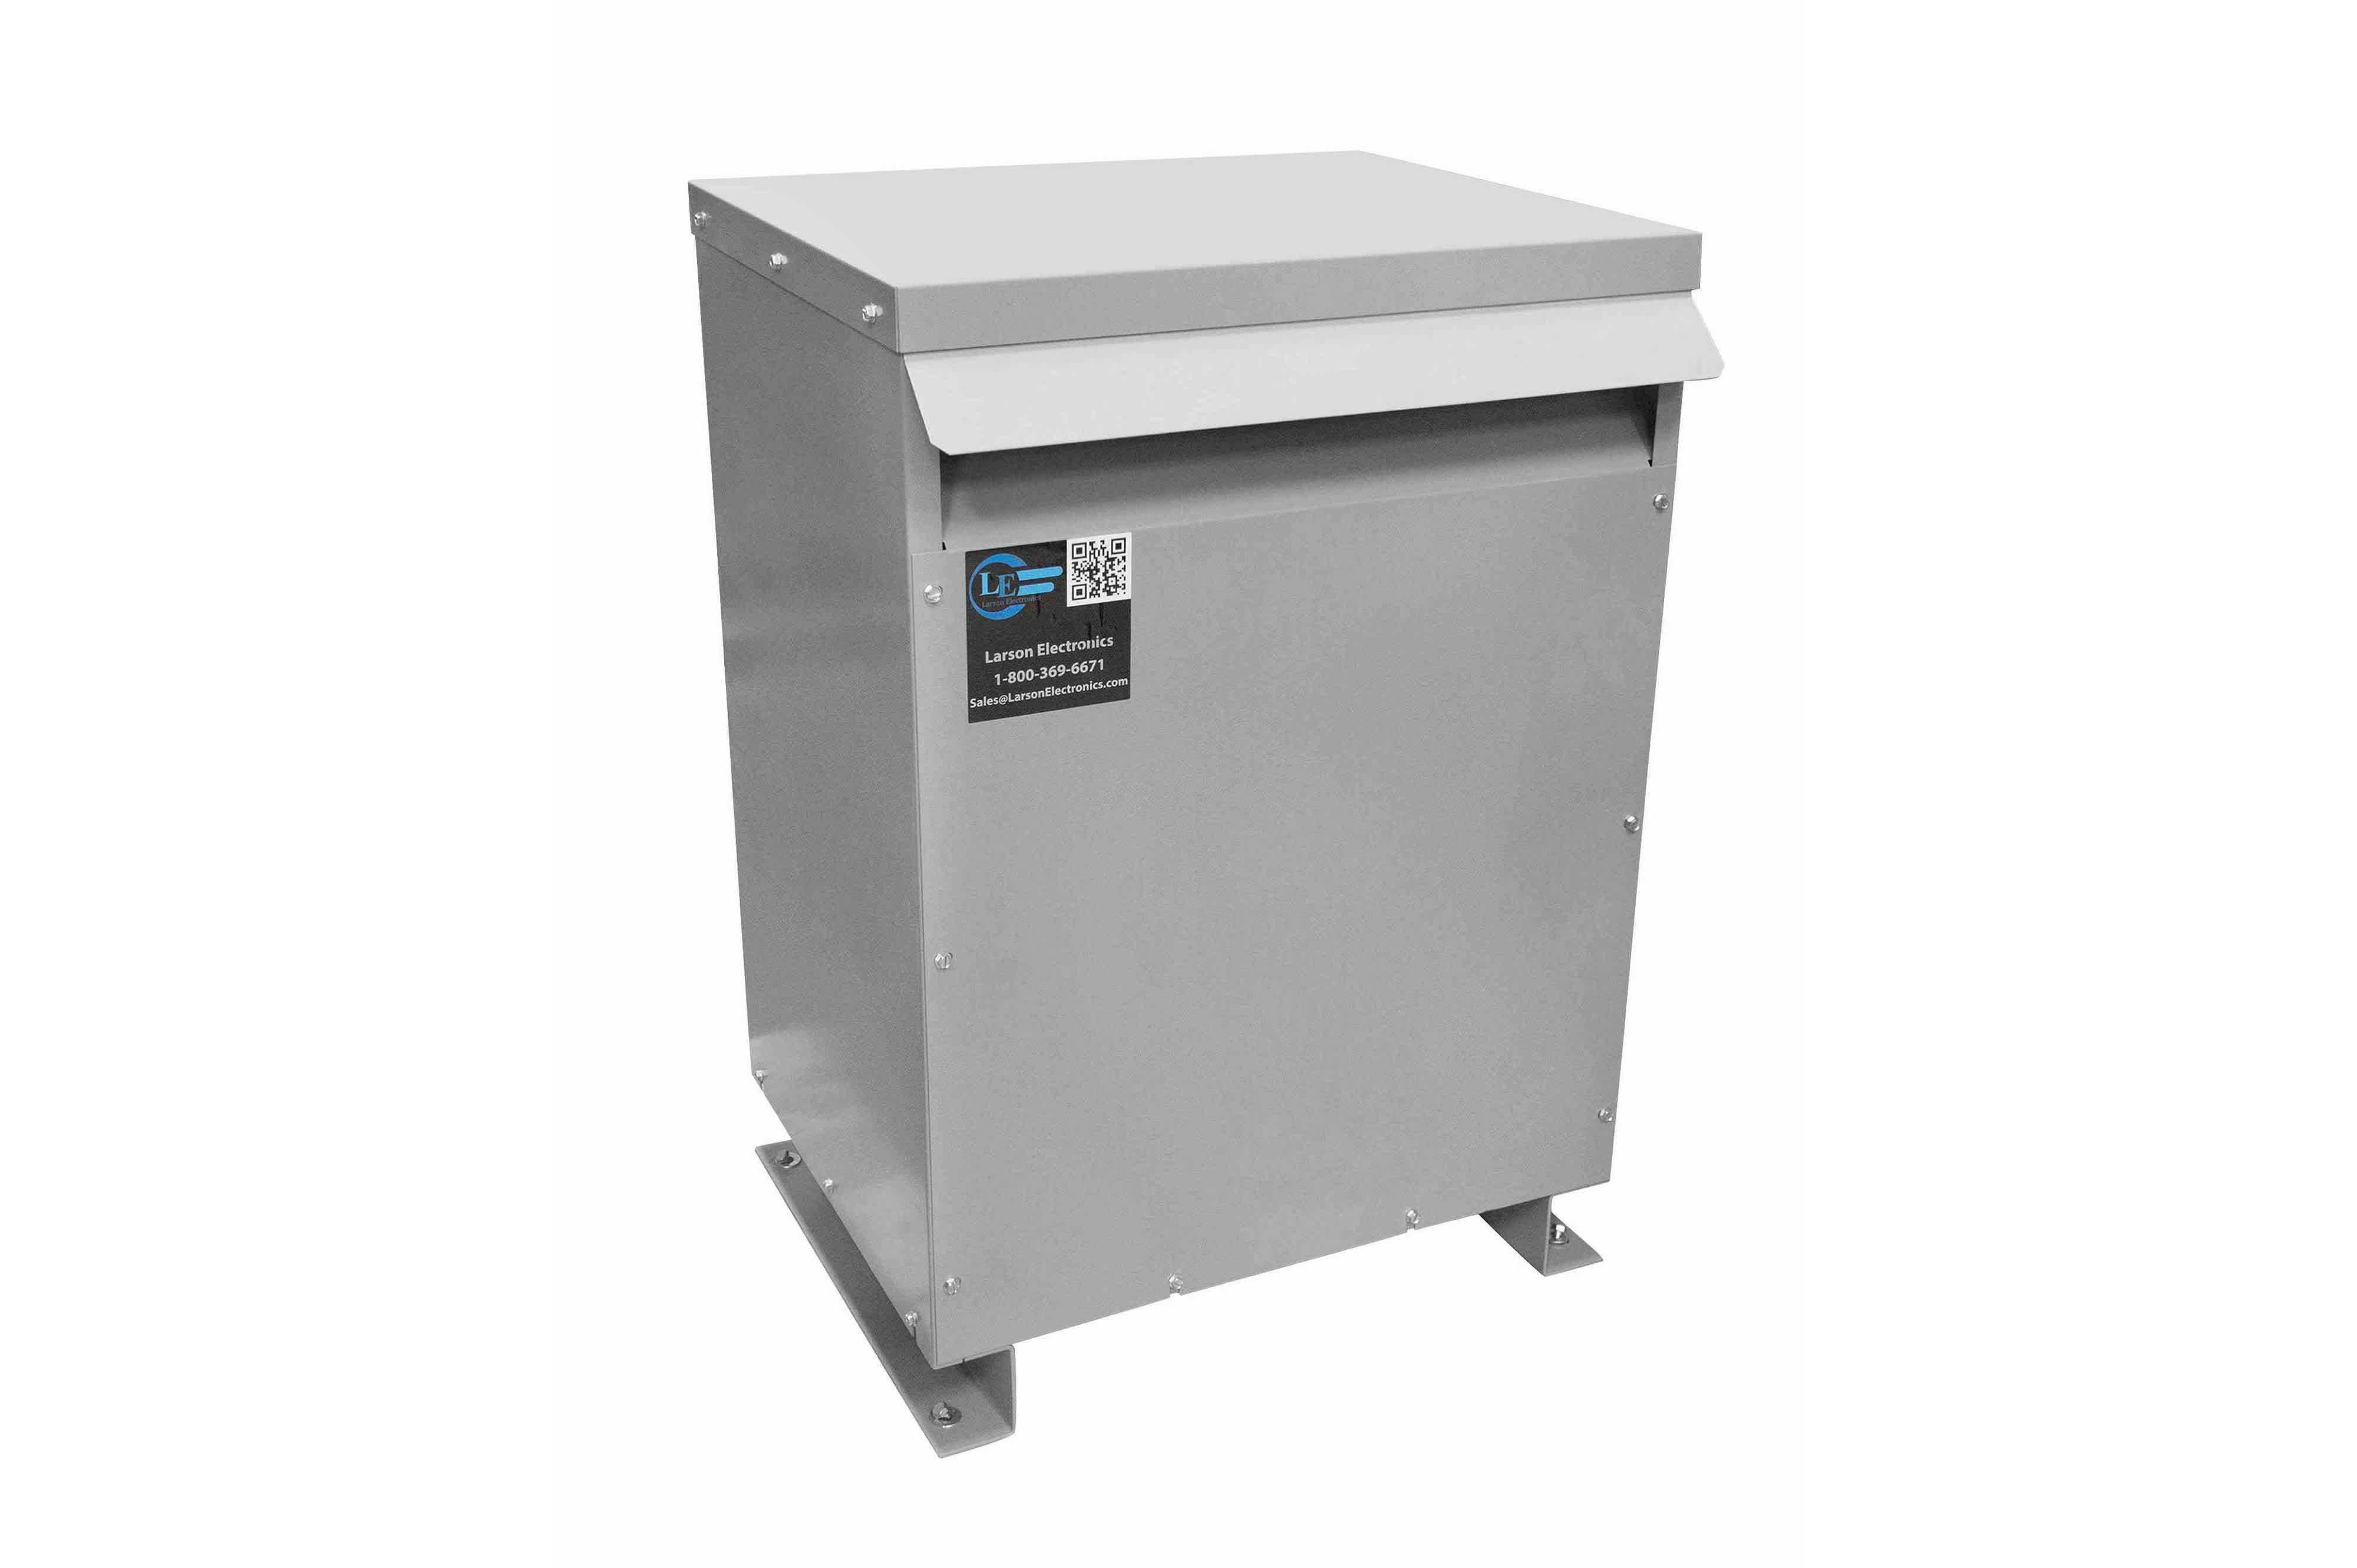 125 kVA 3PH Isolation Transformer, 600V Wye Primary, 400Y/231 Wye-N Secondary, N3R, Ventilated, 60 Hz